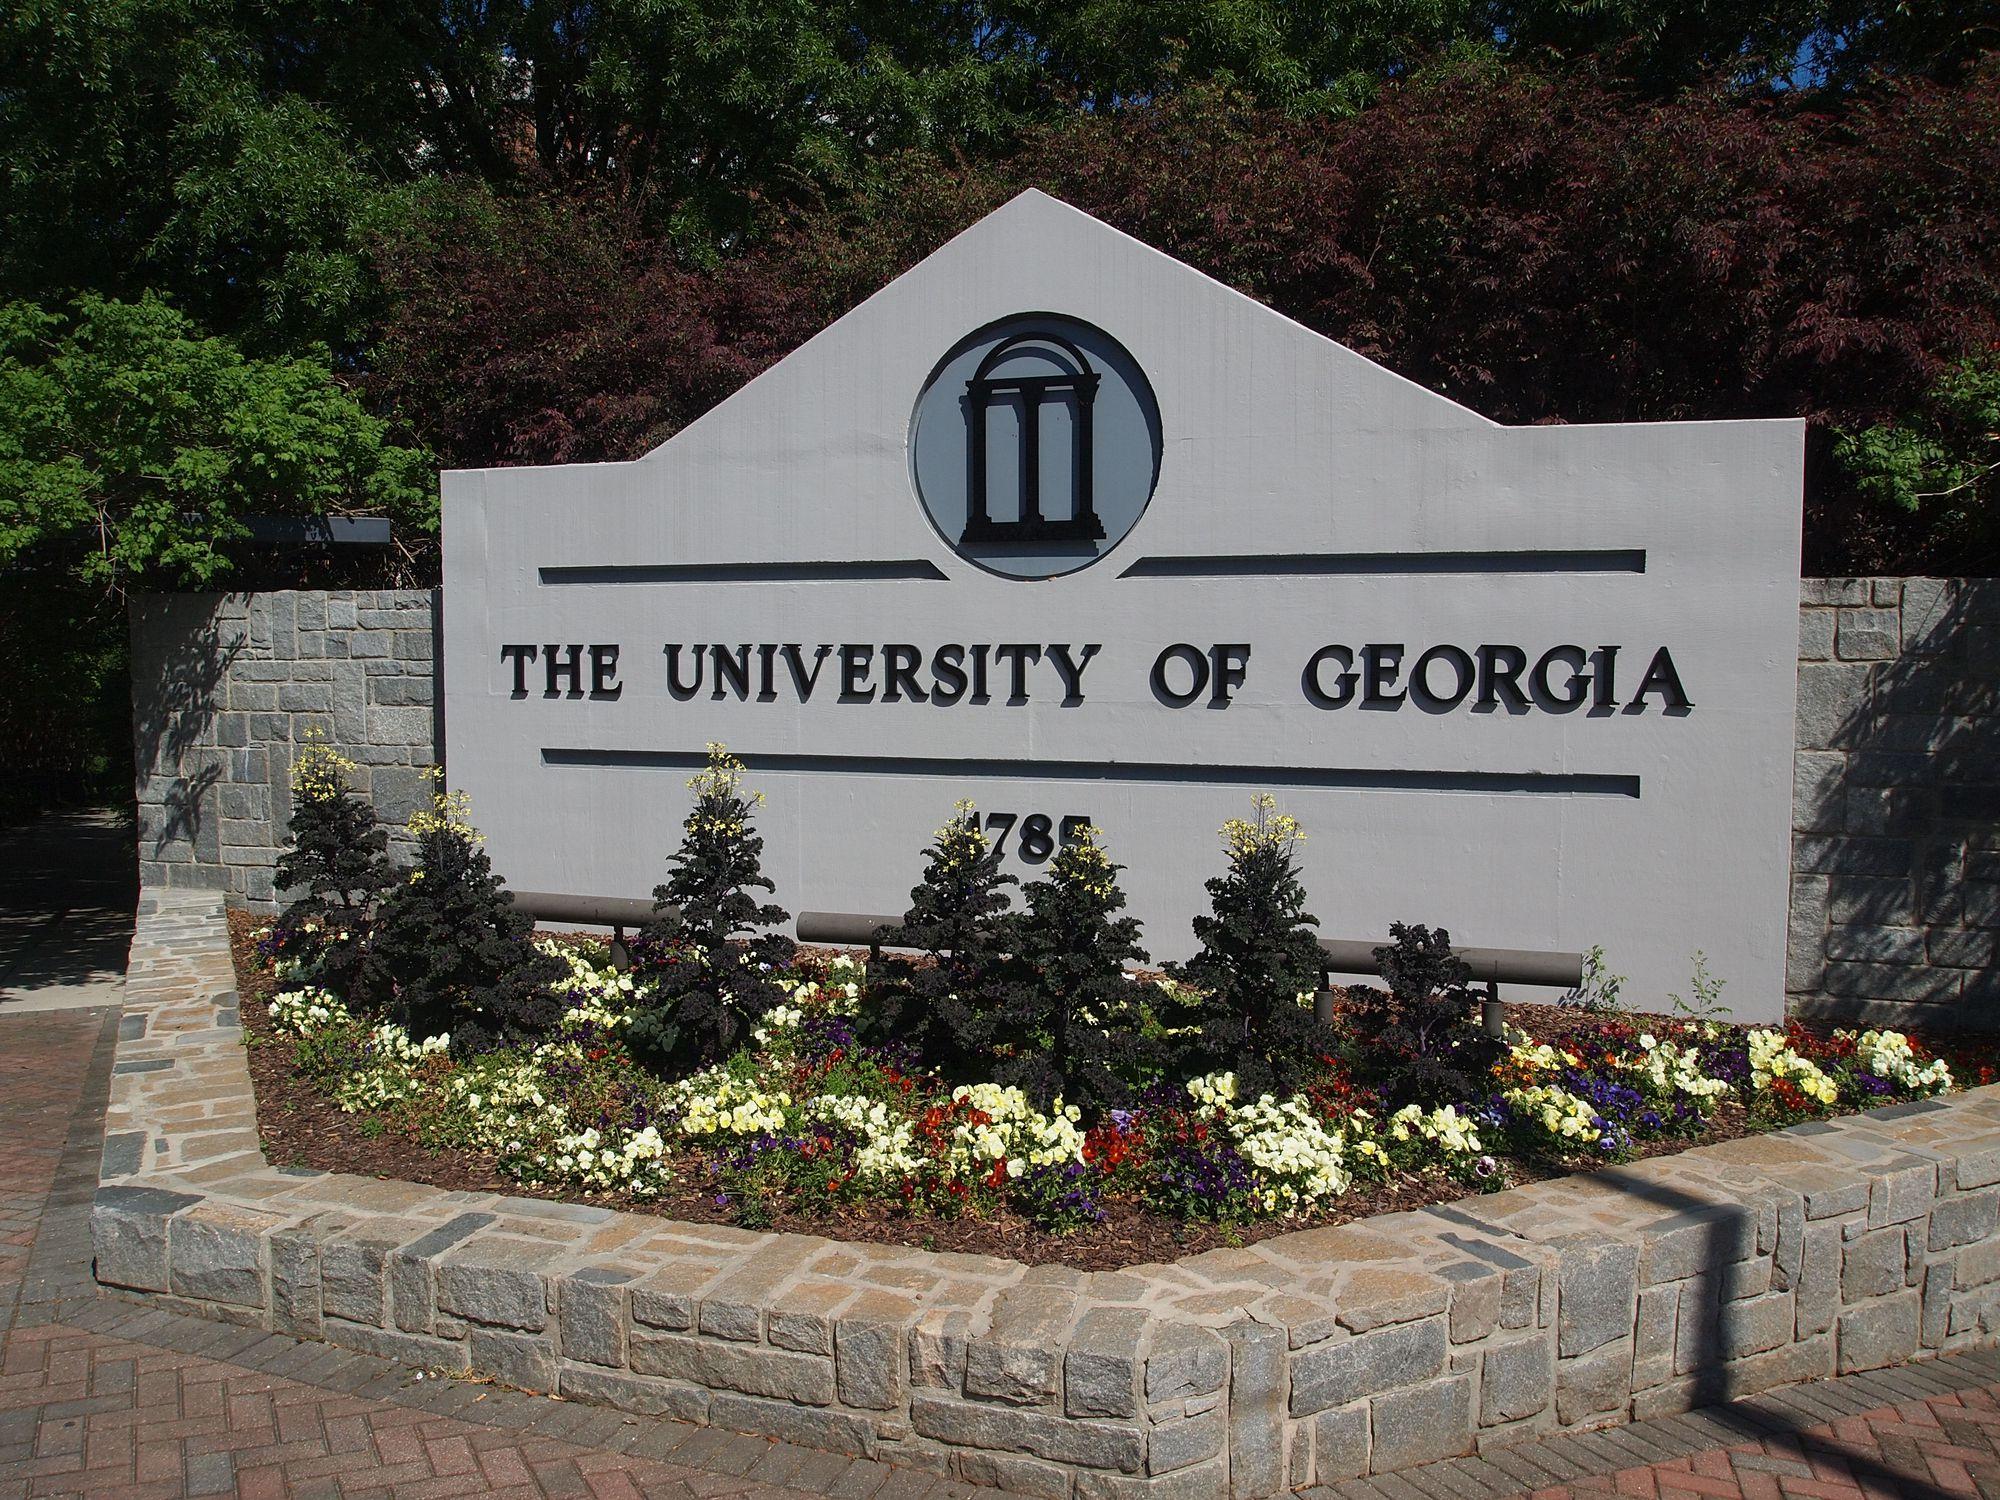 Mba admission essay buy georgia tech